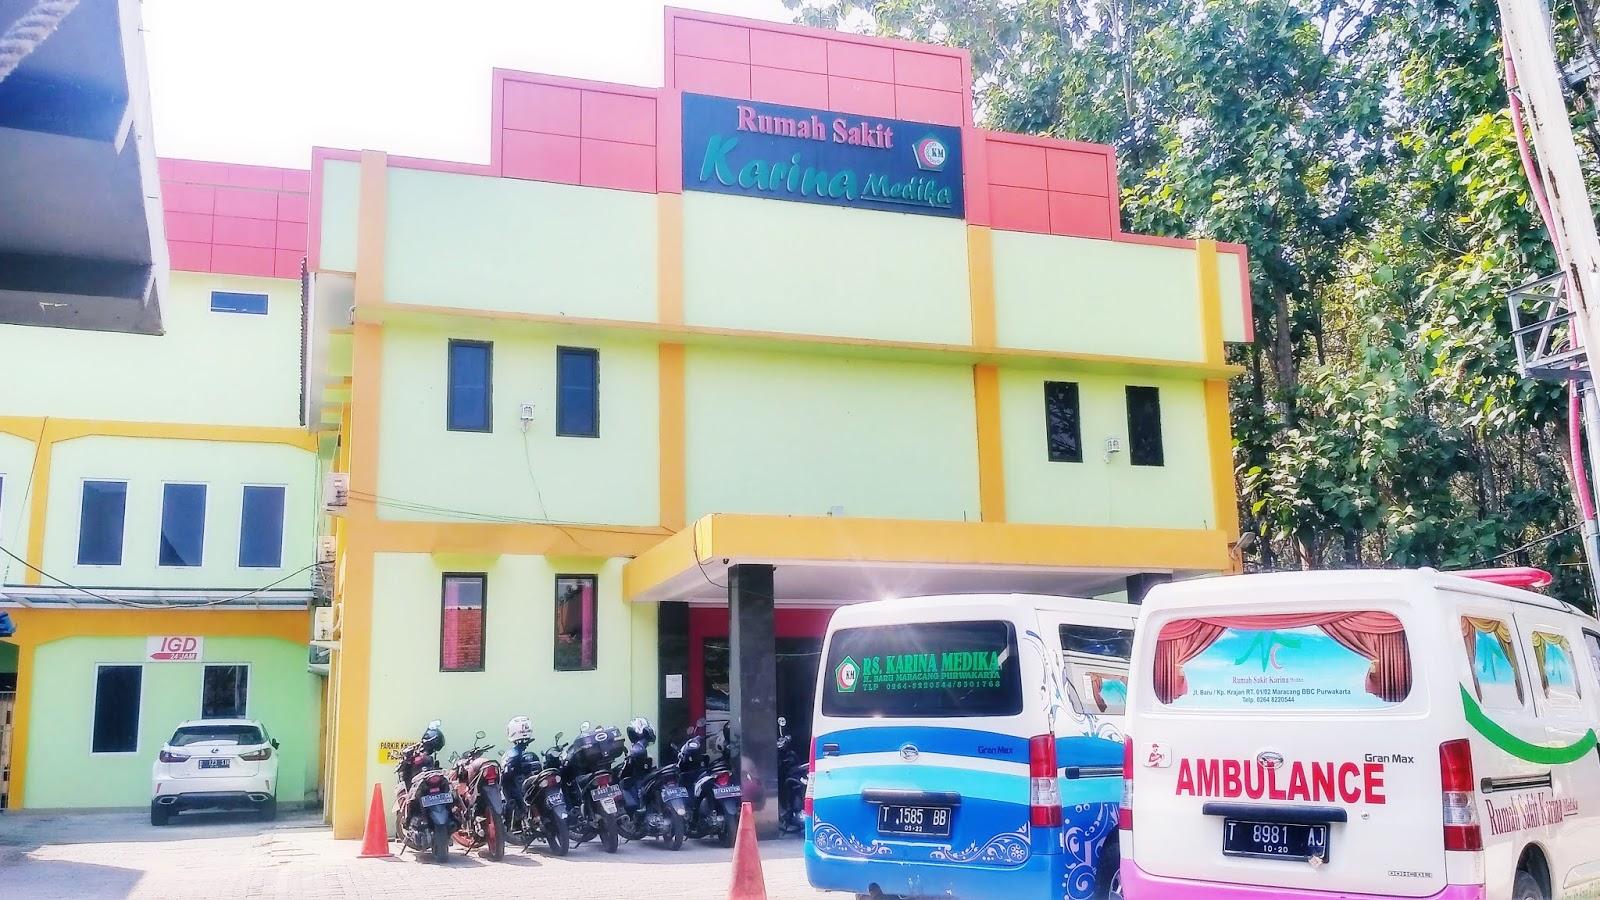 Lowongan Kerja Rumah Sakit Karina Medika Purwakarta